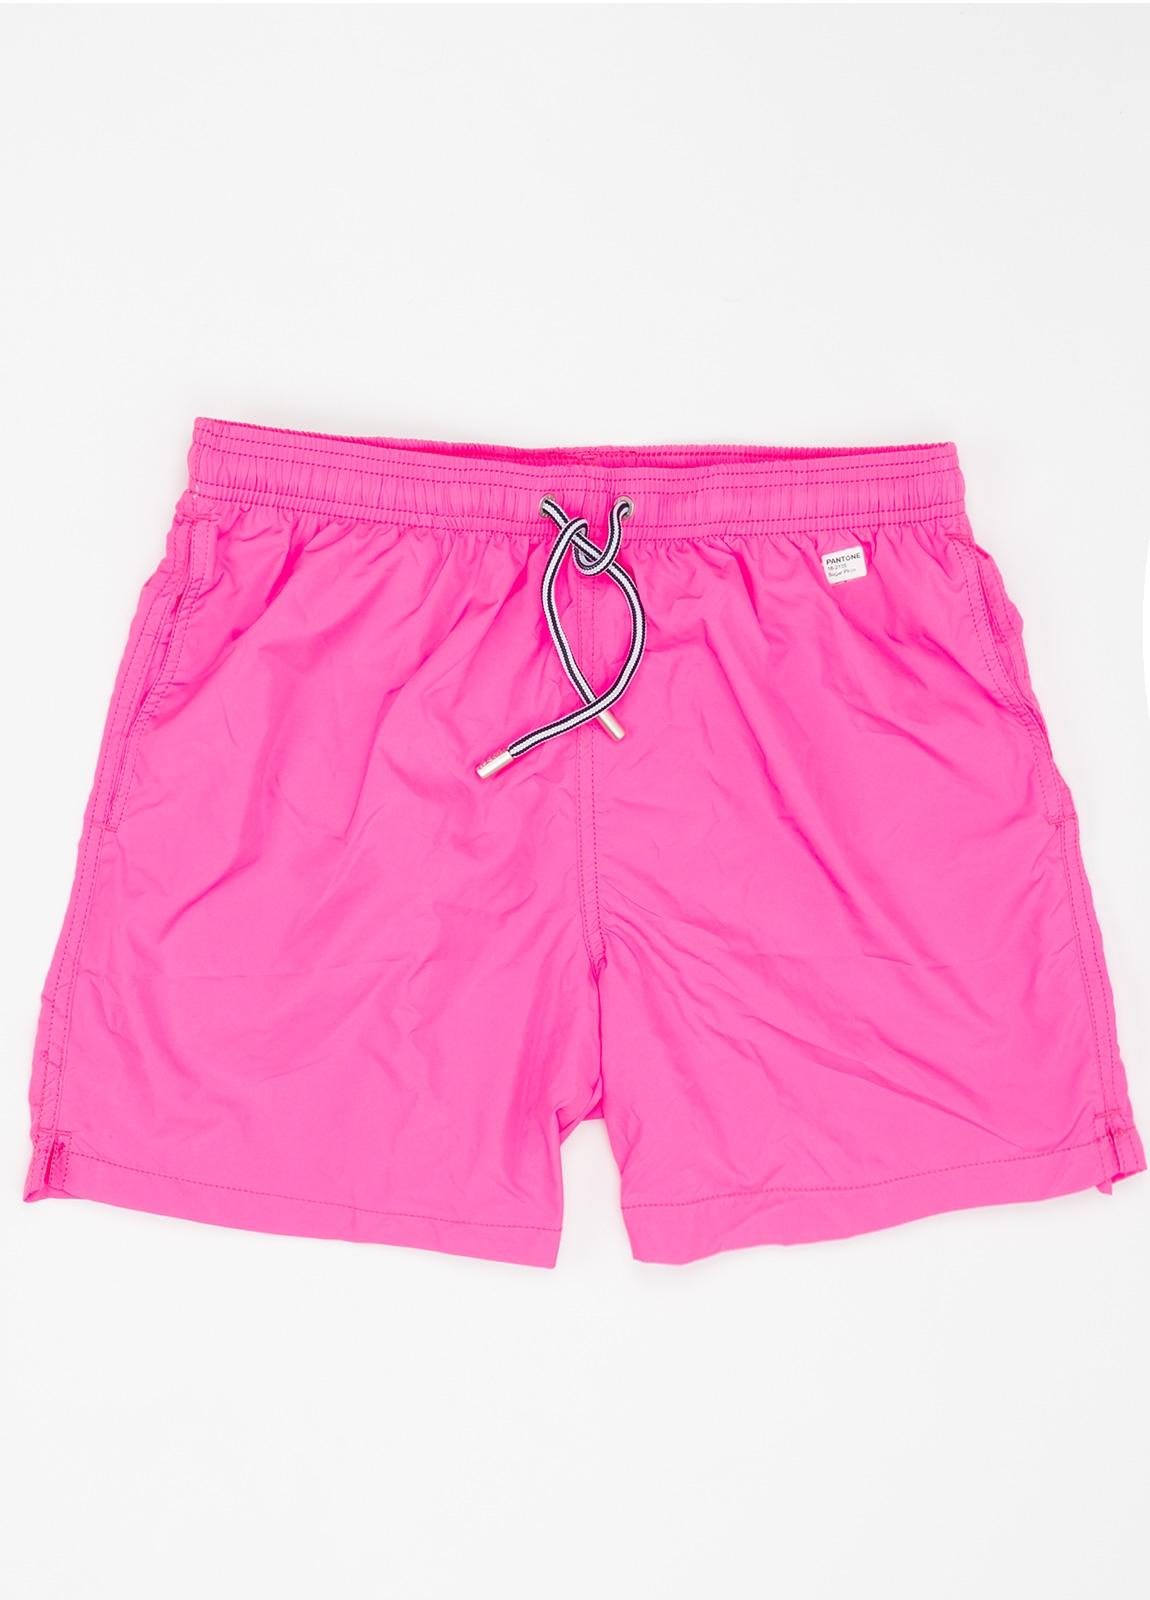 Bañador liso modelo SUPREME color rosa, microfibra.